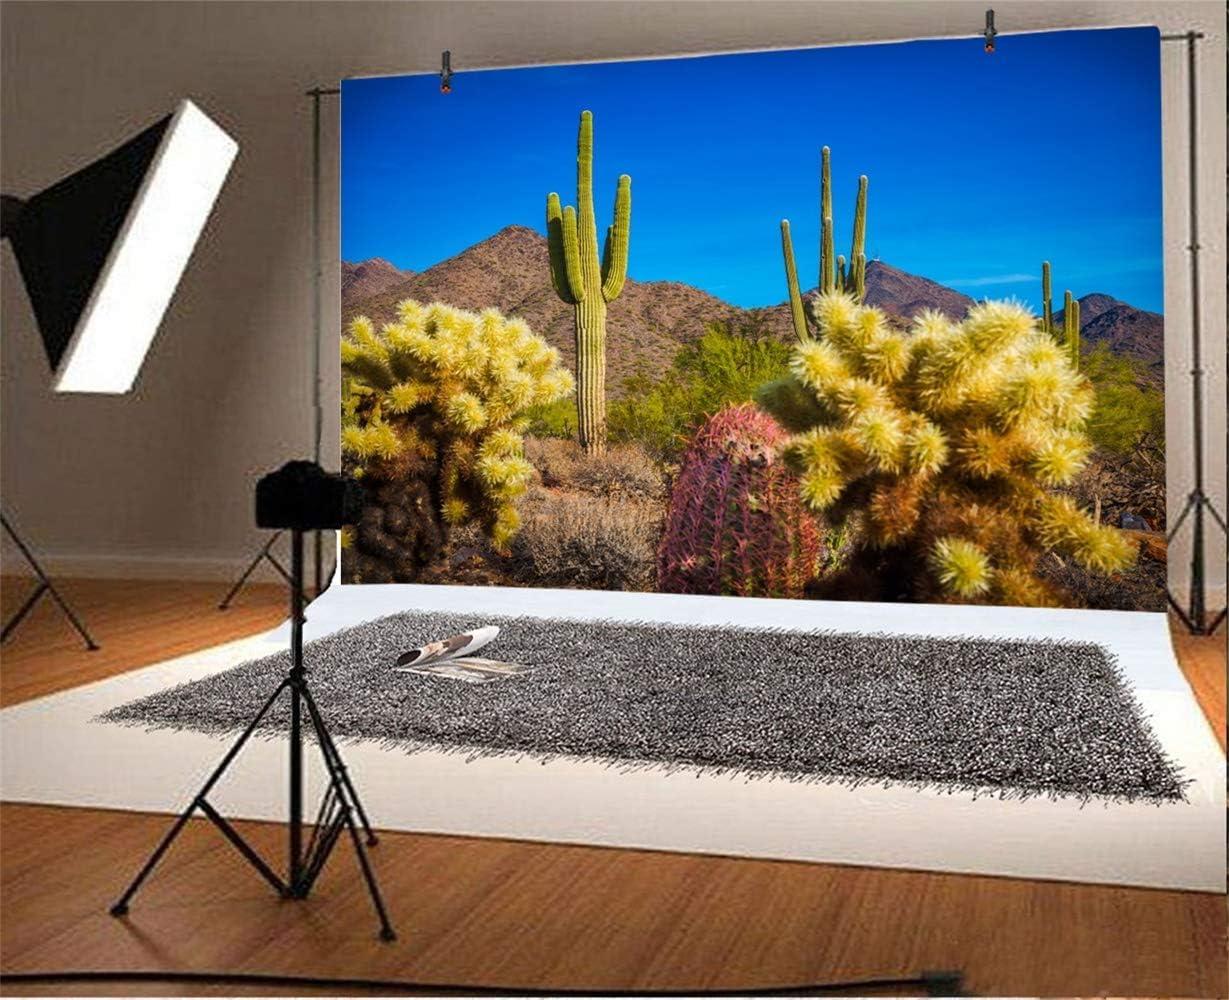 8x6.5ft Solitude Weathered Canyon Sandstones Upward View Background for Photography Arizona Geologic Nature Scenery Backdrop Indoor Decoration Landscape Wallpaper Studio